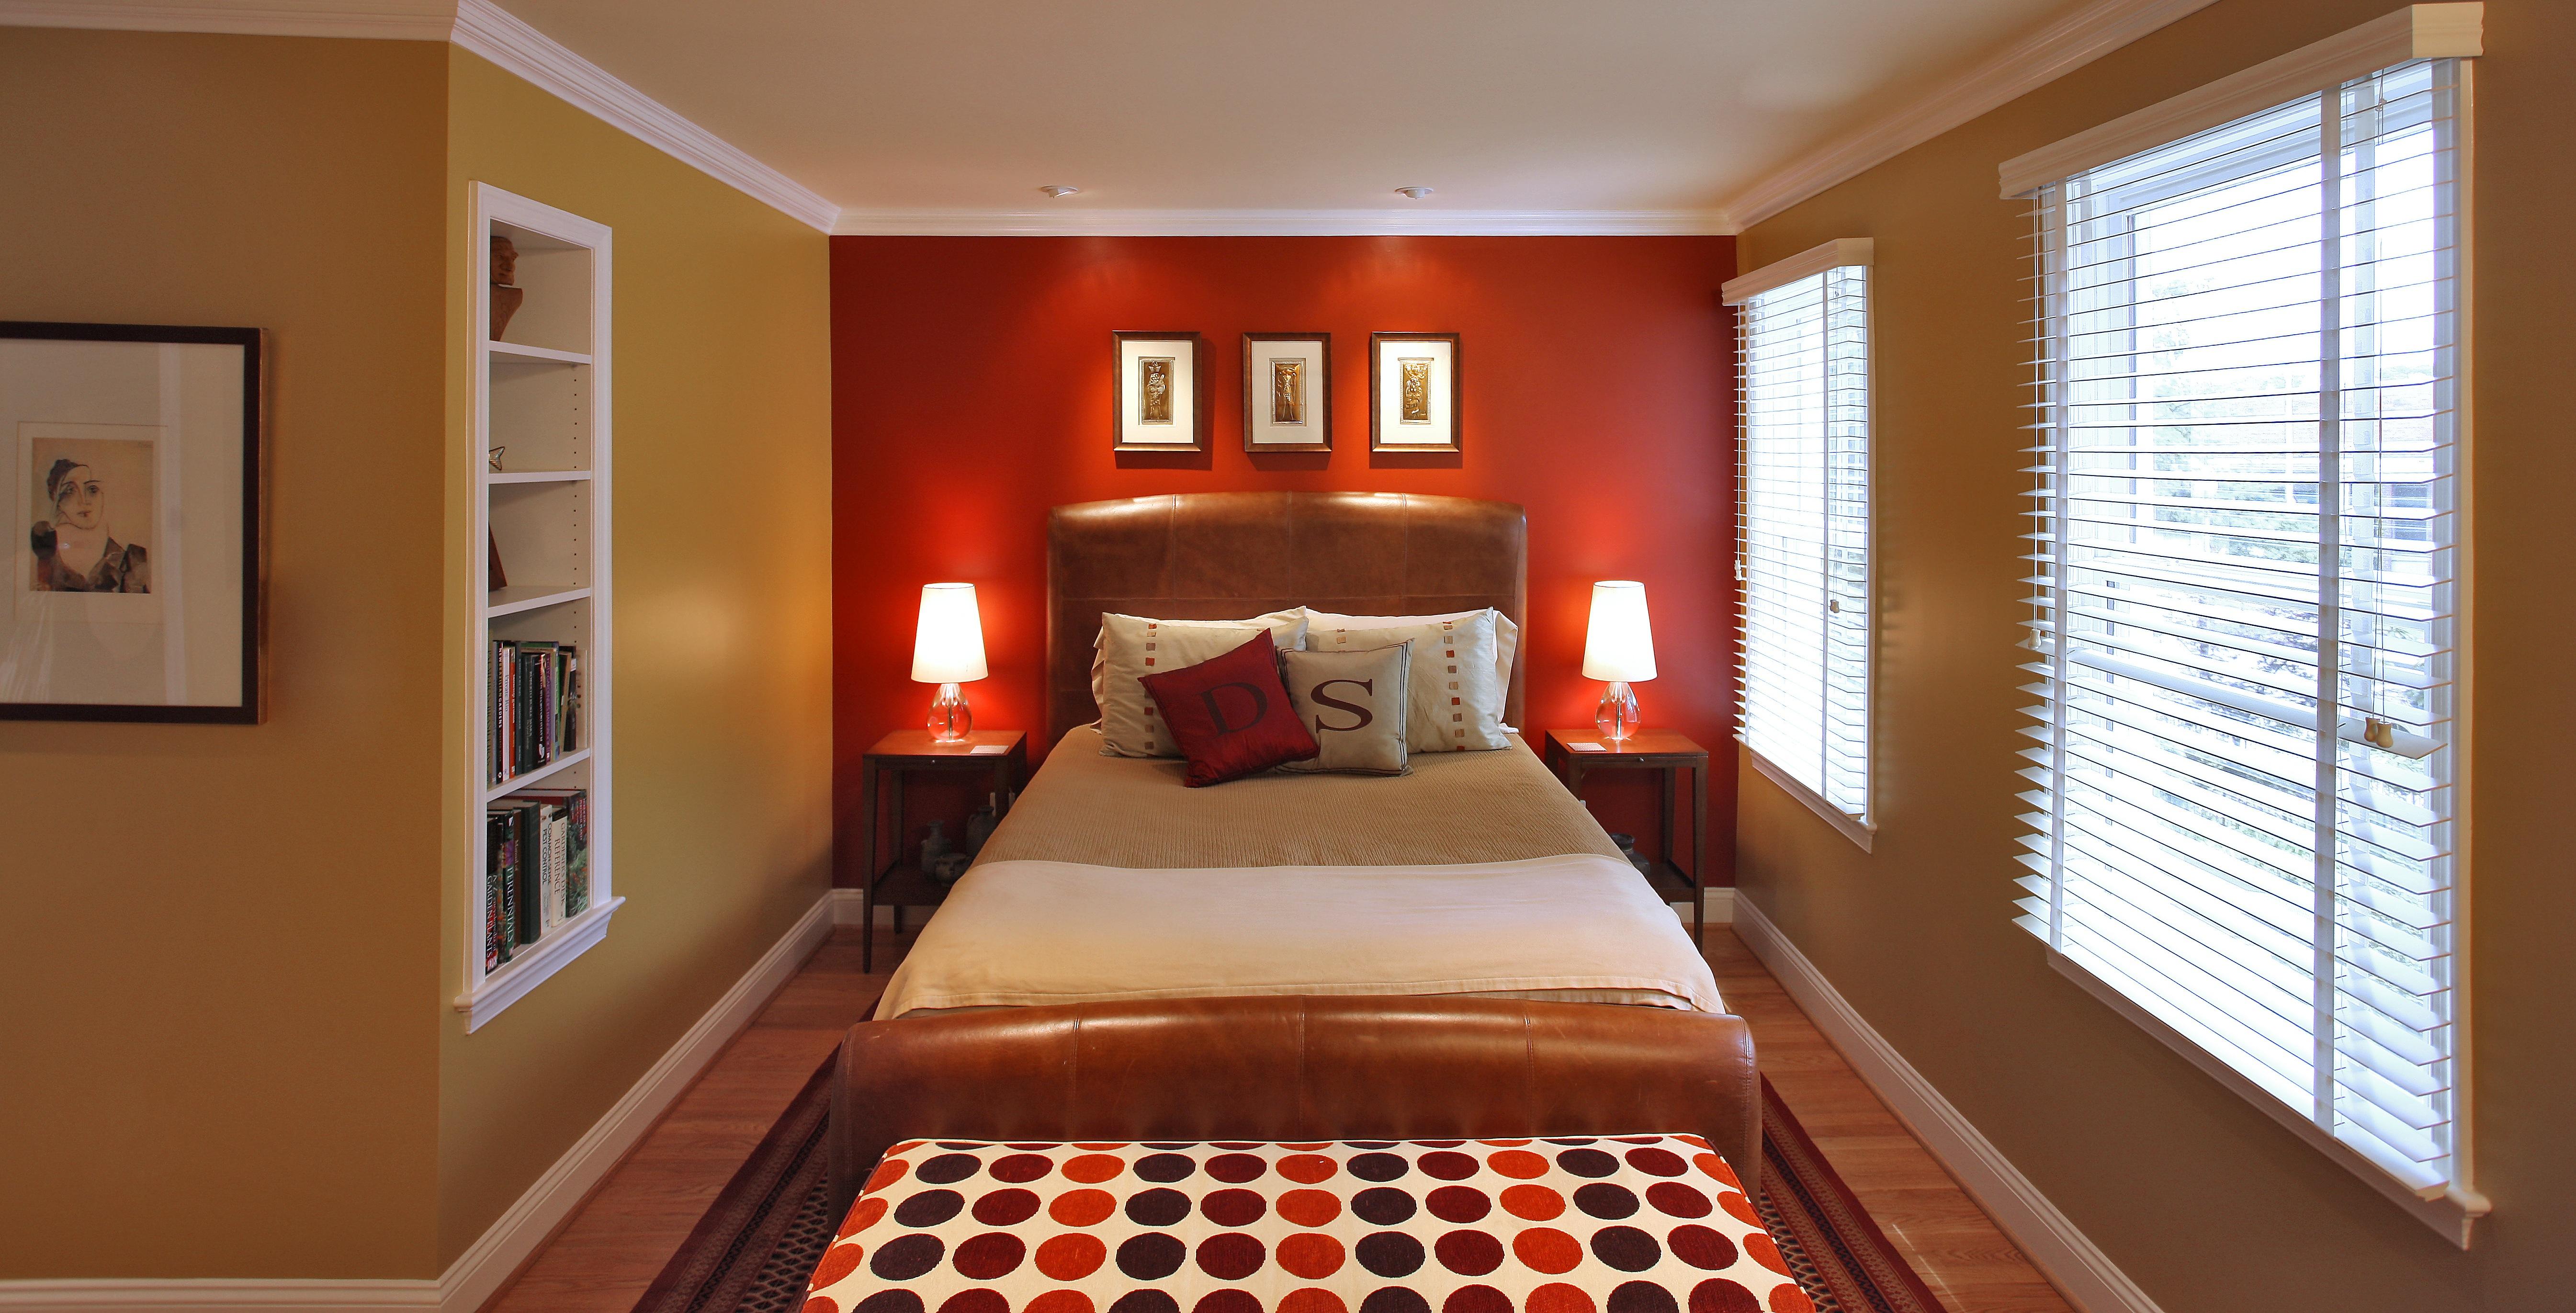 Bethesda Maryland Master Suite Remodeling: Northern Virginia, Maryland And Washington D.C. Master